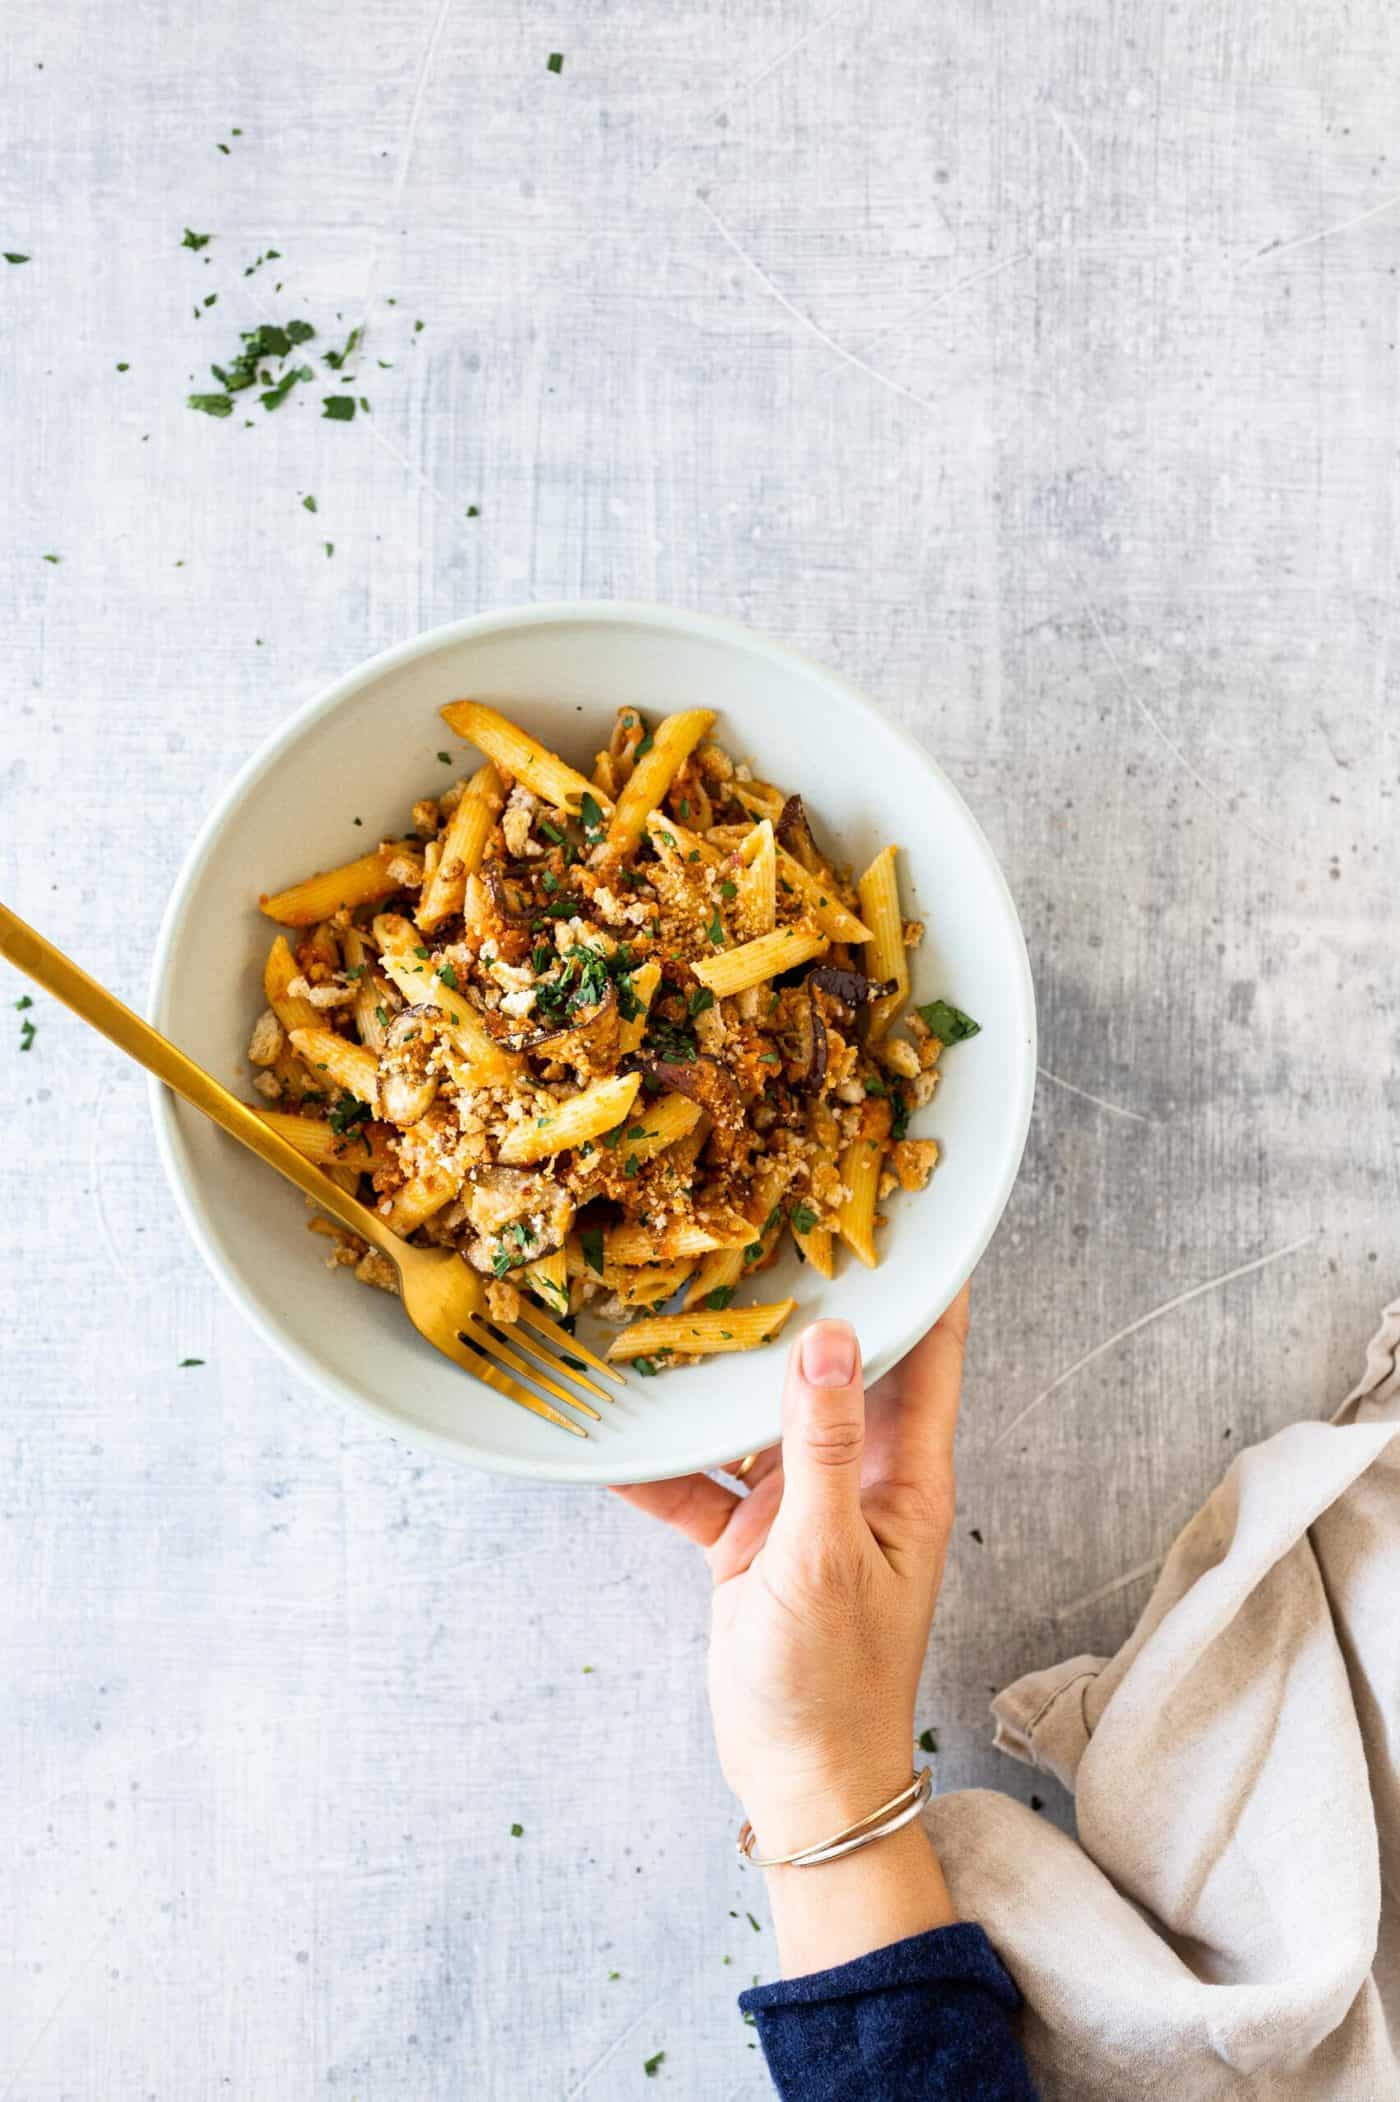 Easy Eggplant Parmesan Pasta recipe via thepigandquill #vegetarian #weeknightmeal #vegan #dinner